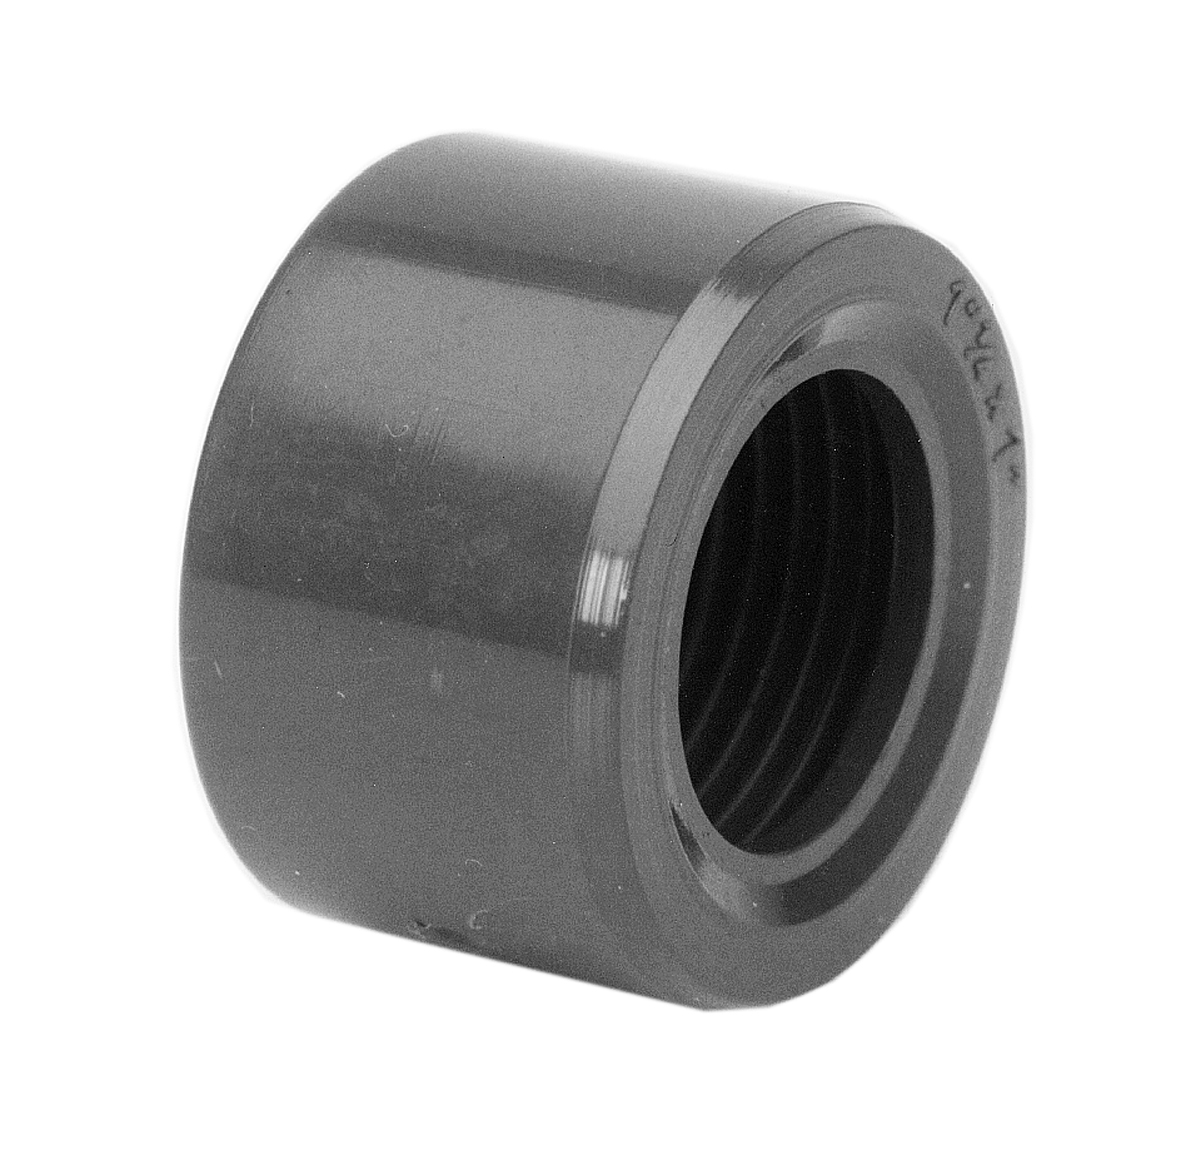 PVC-U riduzione corta maschio - femmina - EFFAST - 100% Made in Italy